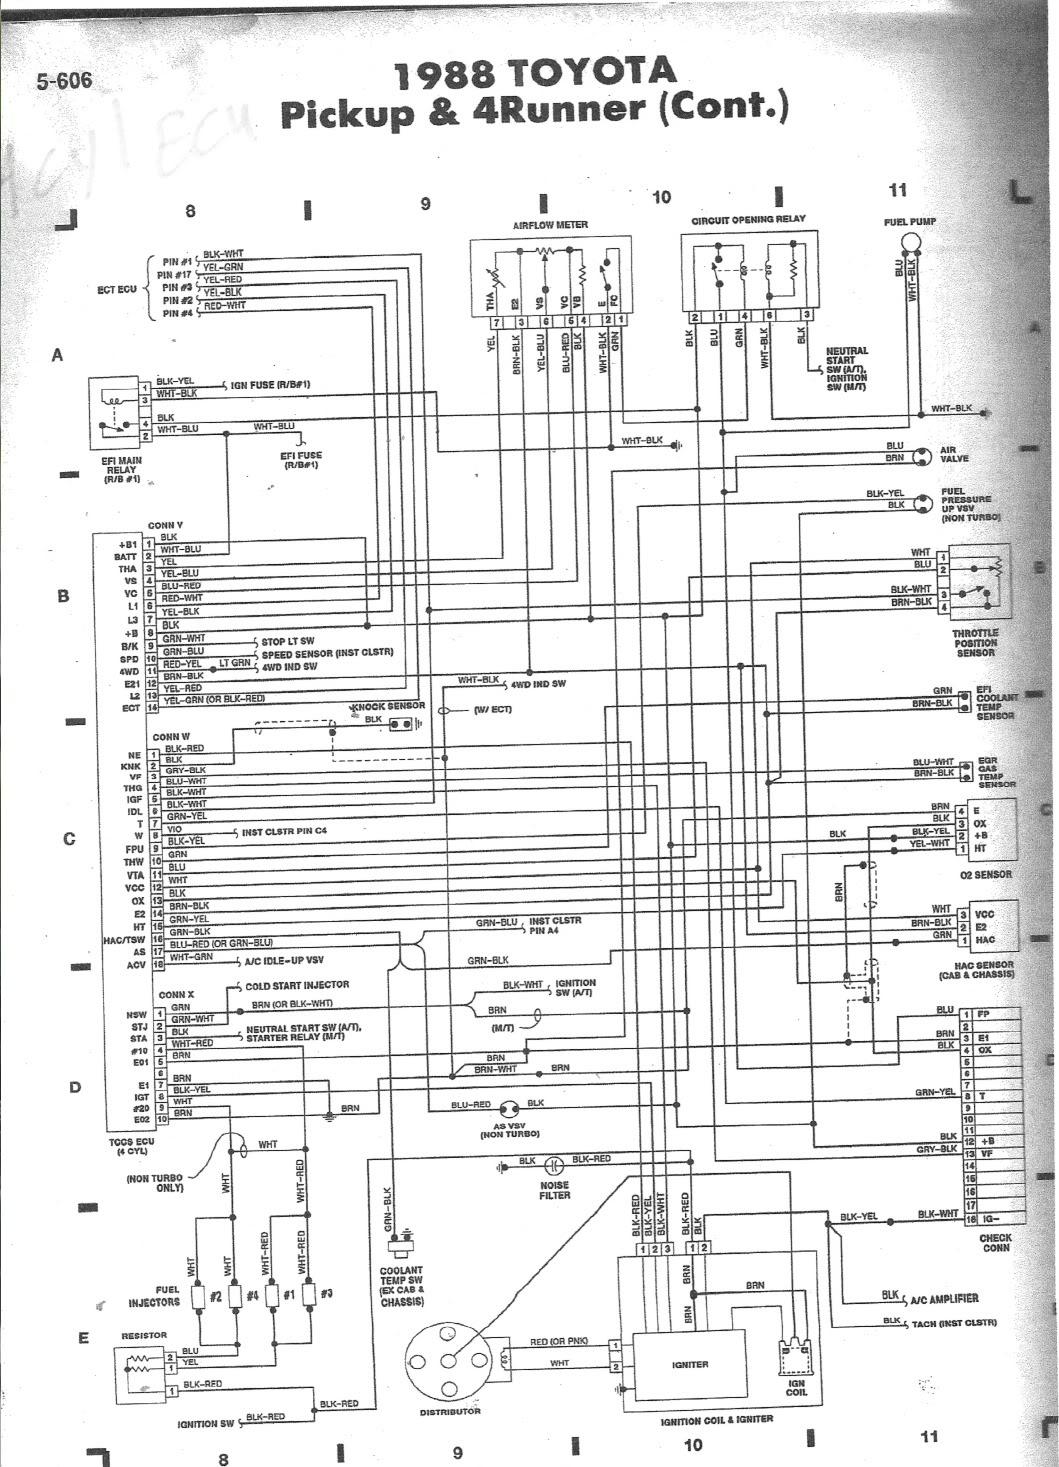 1988 toyota 22r engine wiring schematics wiring diagrams u2022 rh seniorlivinguniversity co 85 Toyota Pickup Wiring Diagram 1988 Toyota Pickup Wiring Diagram